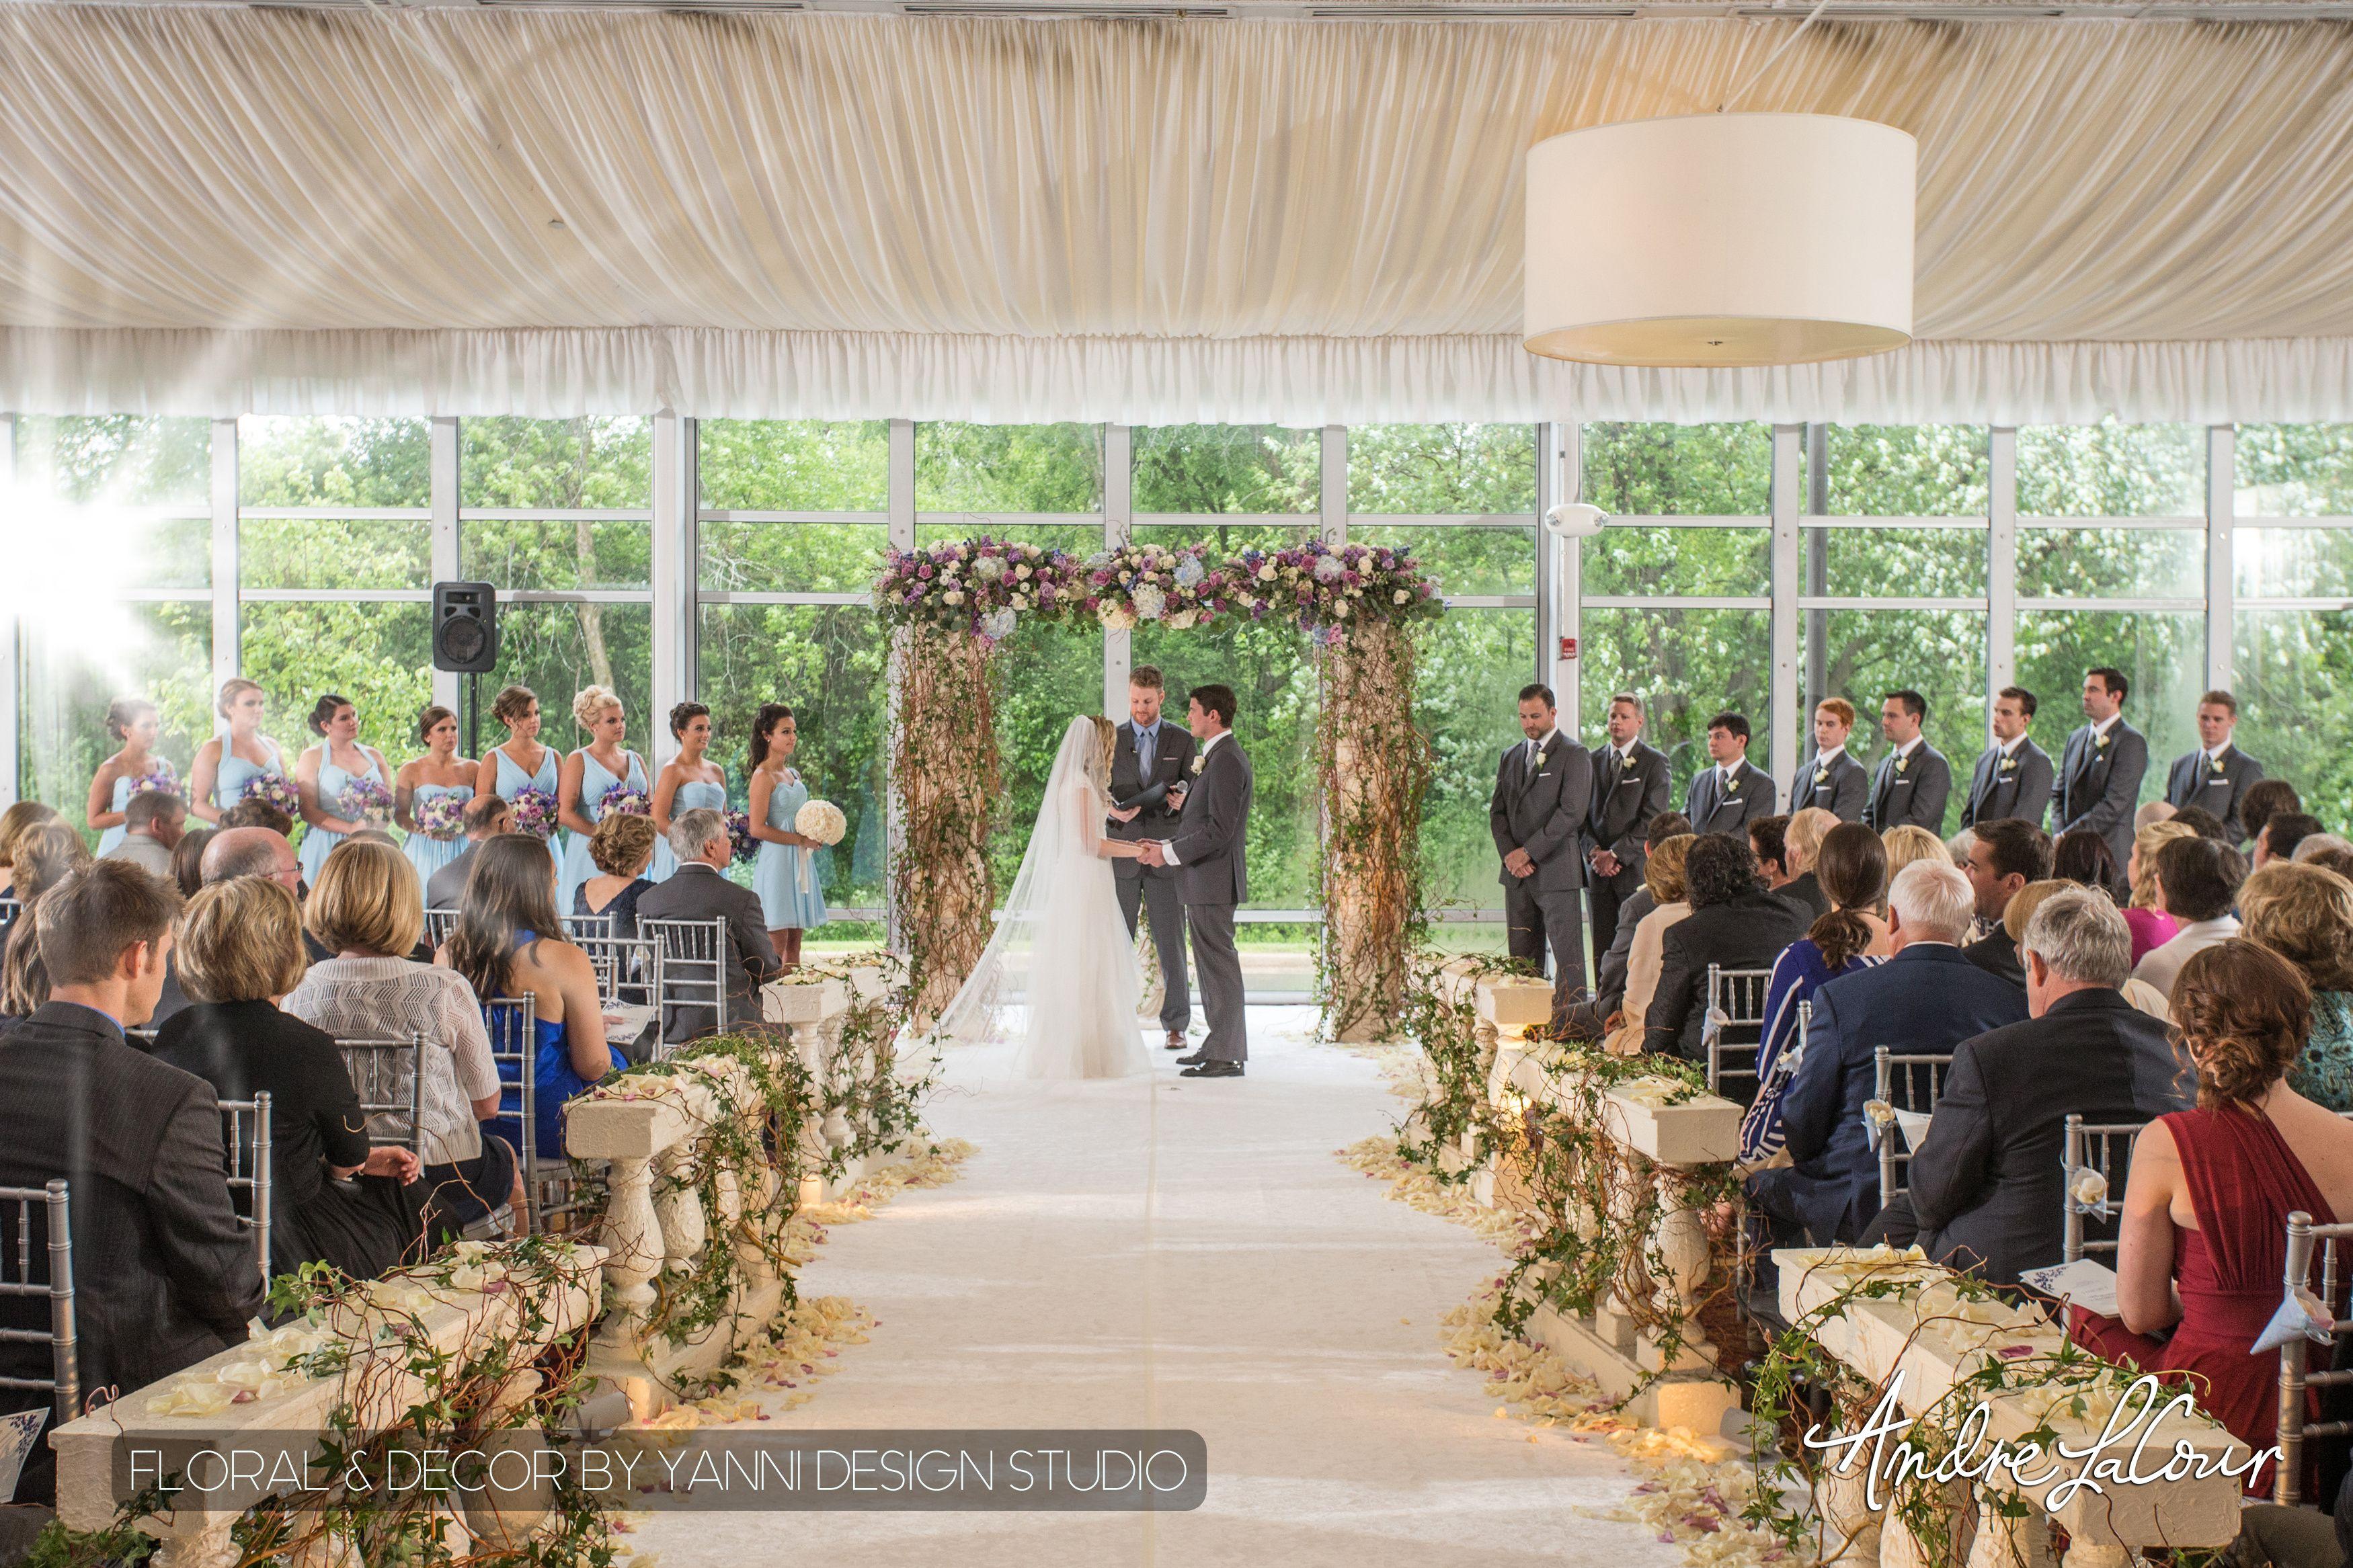 Wedding Flowers And Decorations Luxury Wedding Designers Resort Wedding Decor Wedding Wedding Decorations